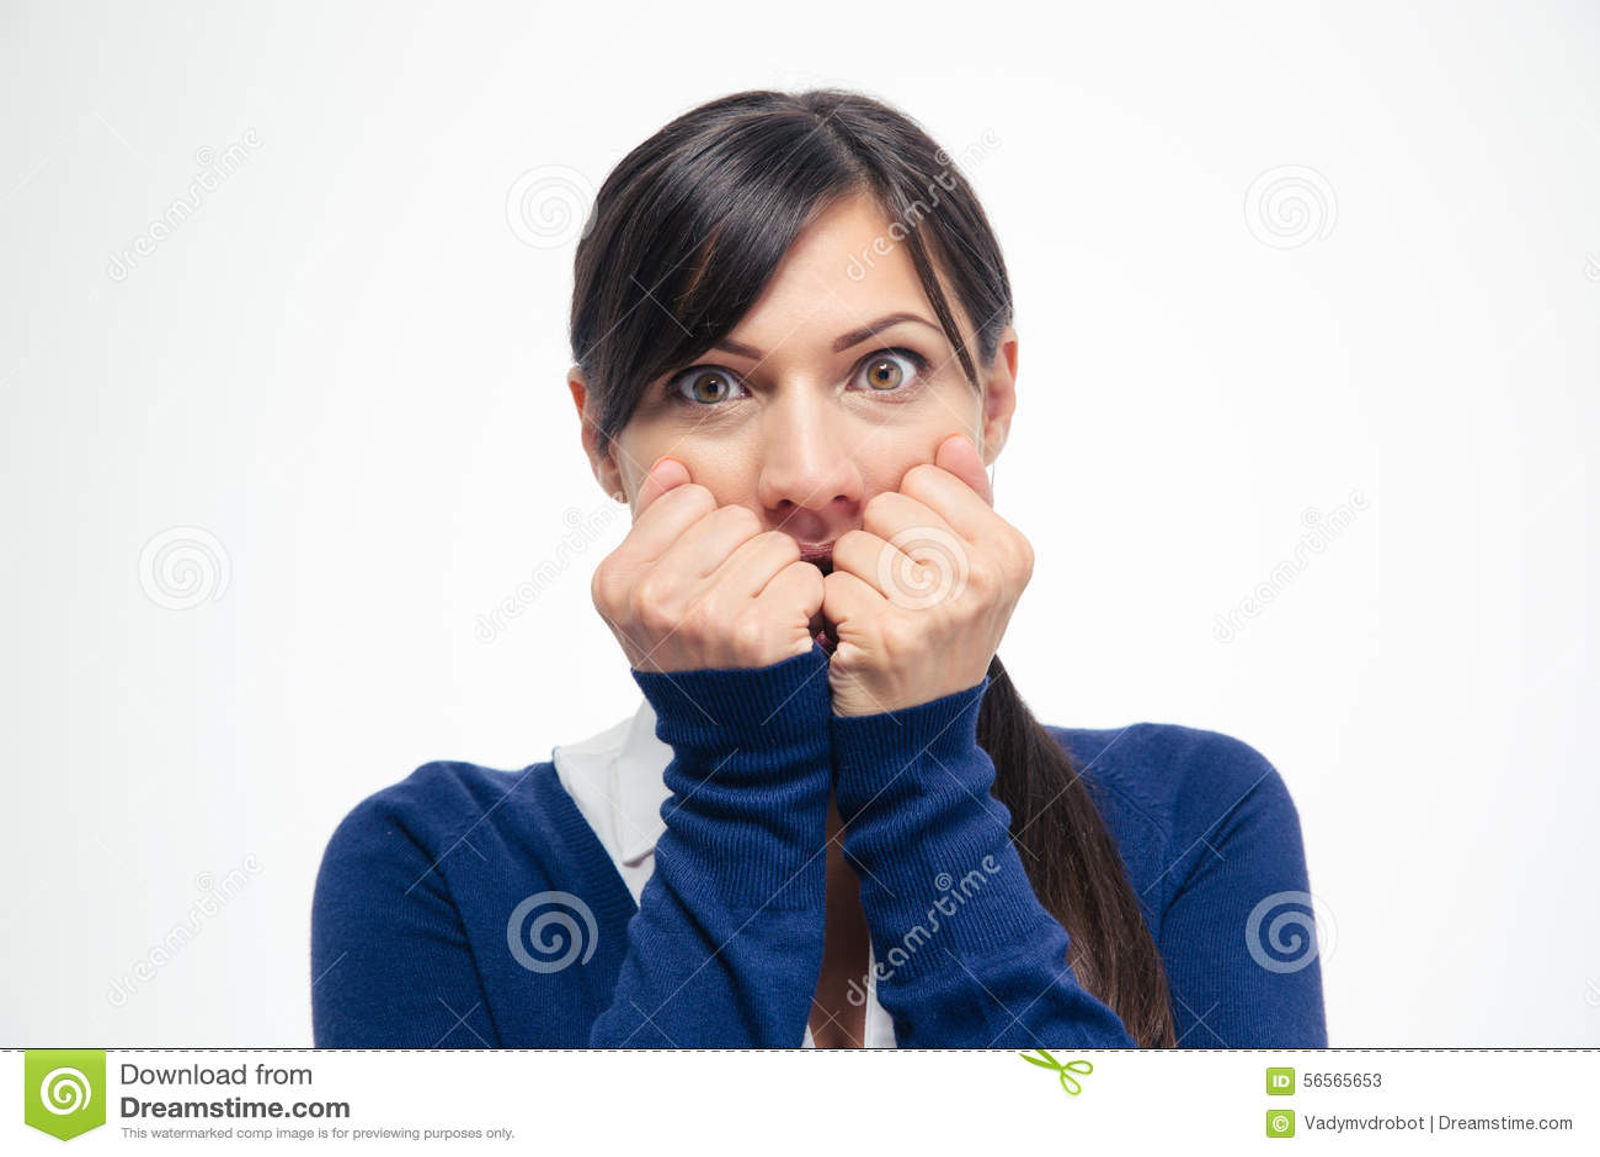 Download Φοβησμένη επιχειρηματίας που εξετάζει τη κάμερα Στοκ Εικόνα - εικόνα από φρίκη, scary: 56565653